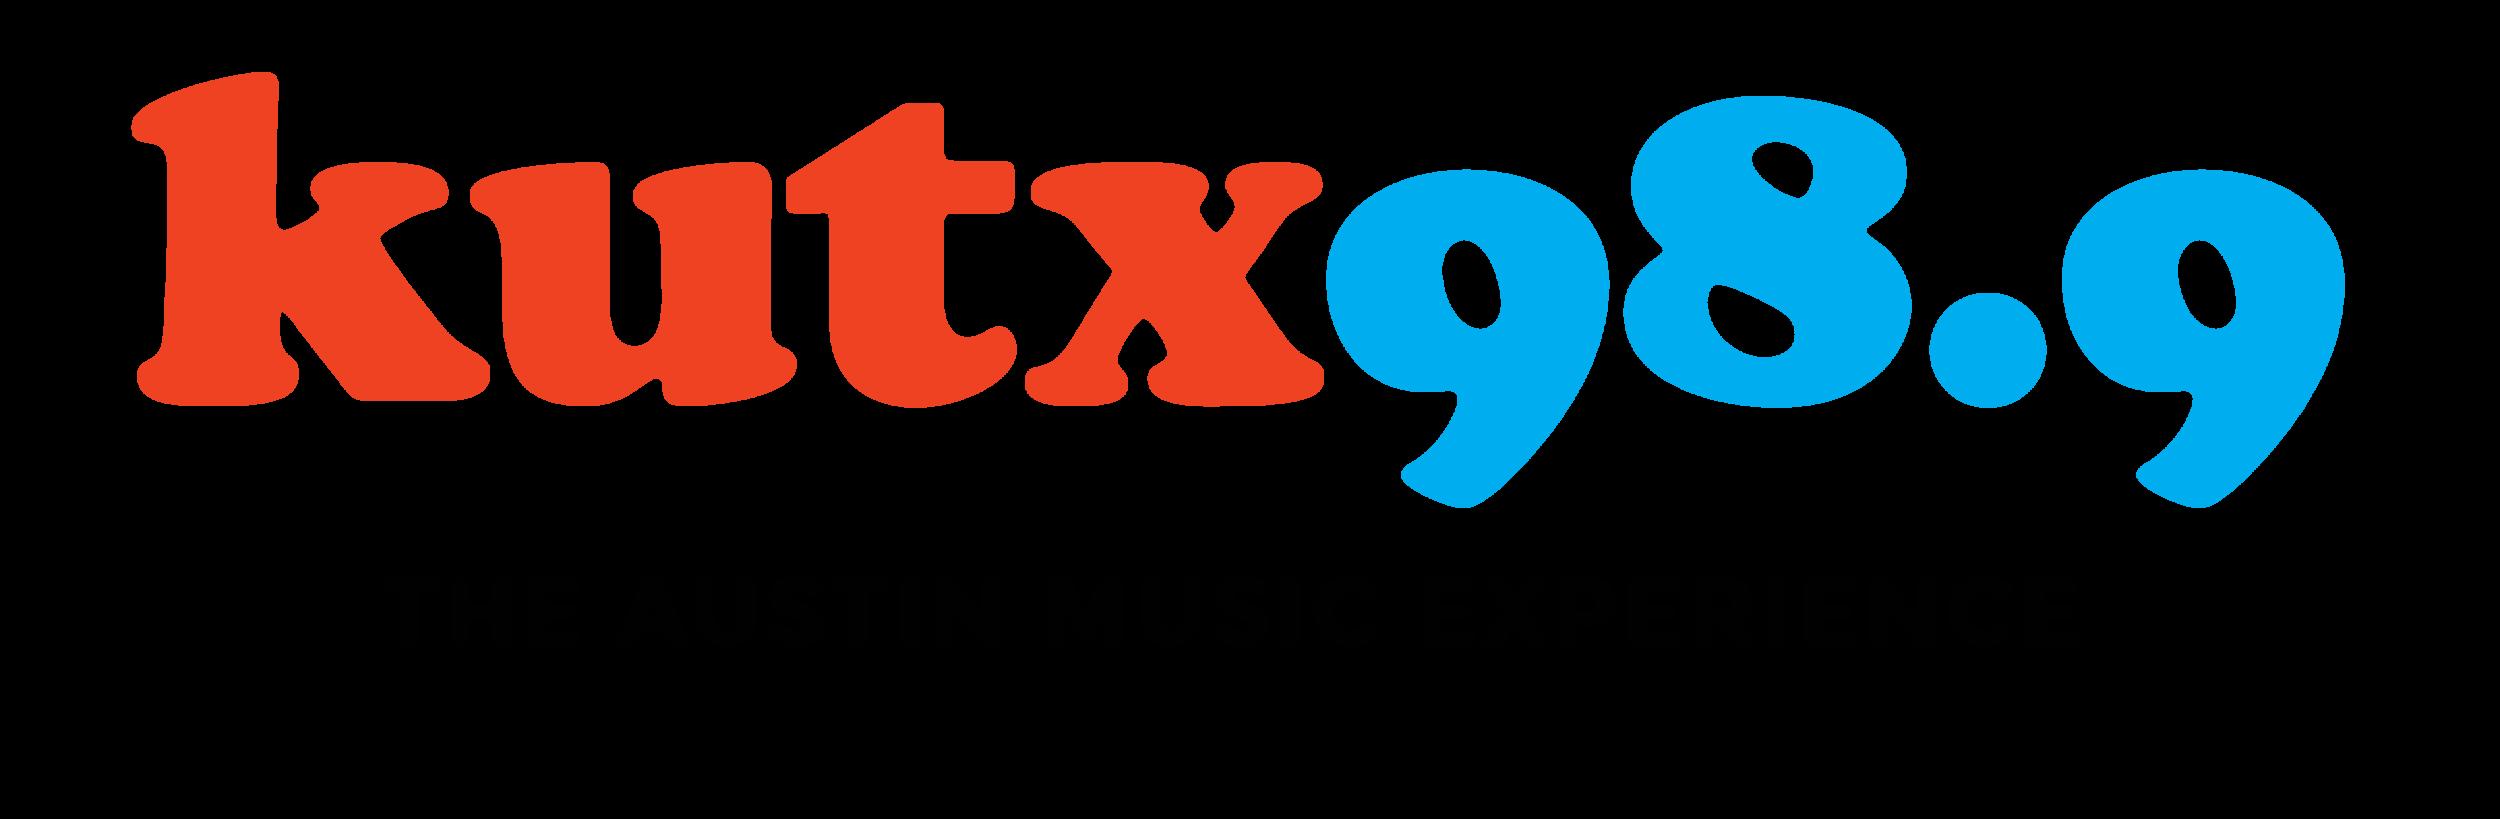 KUTX logo.png